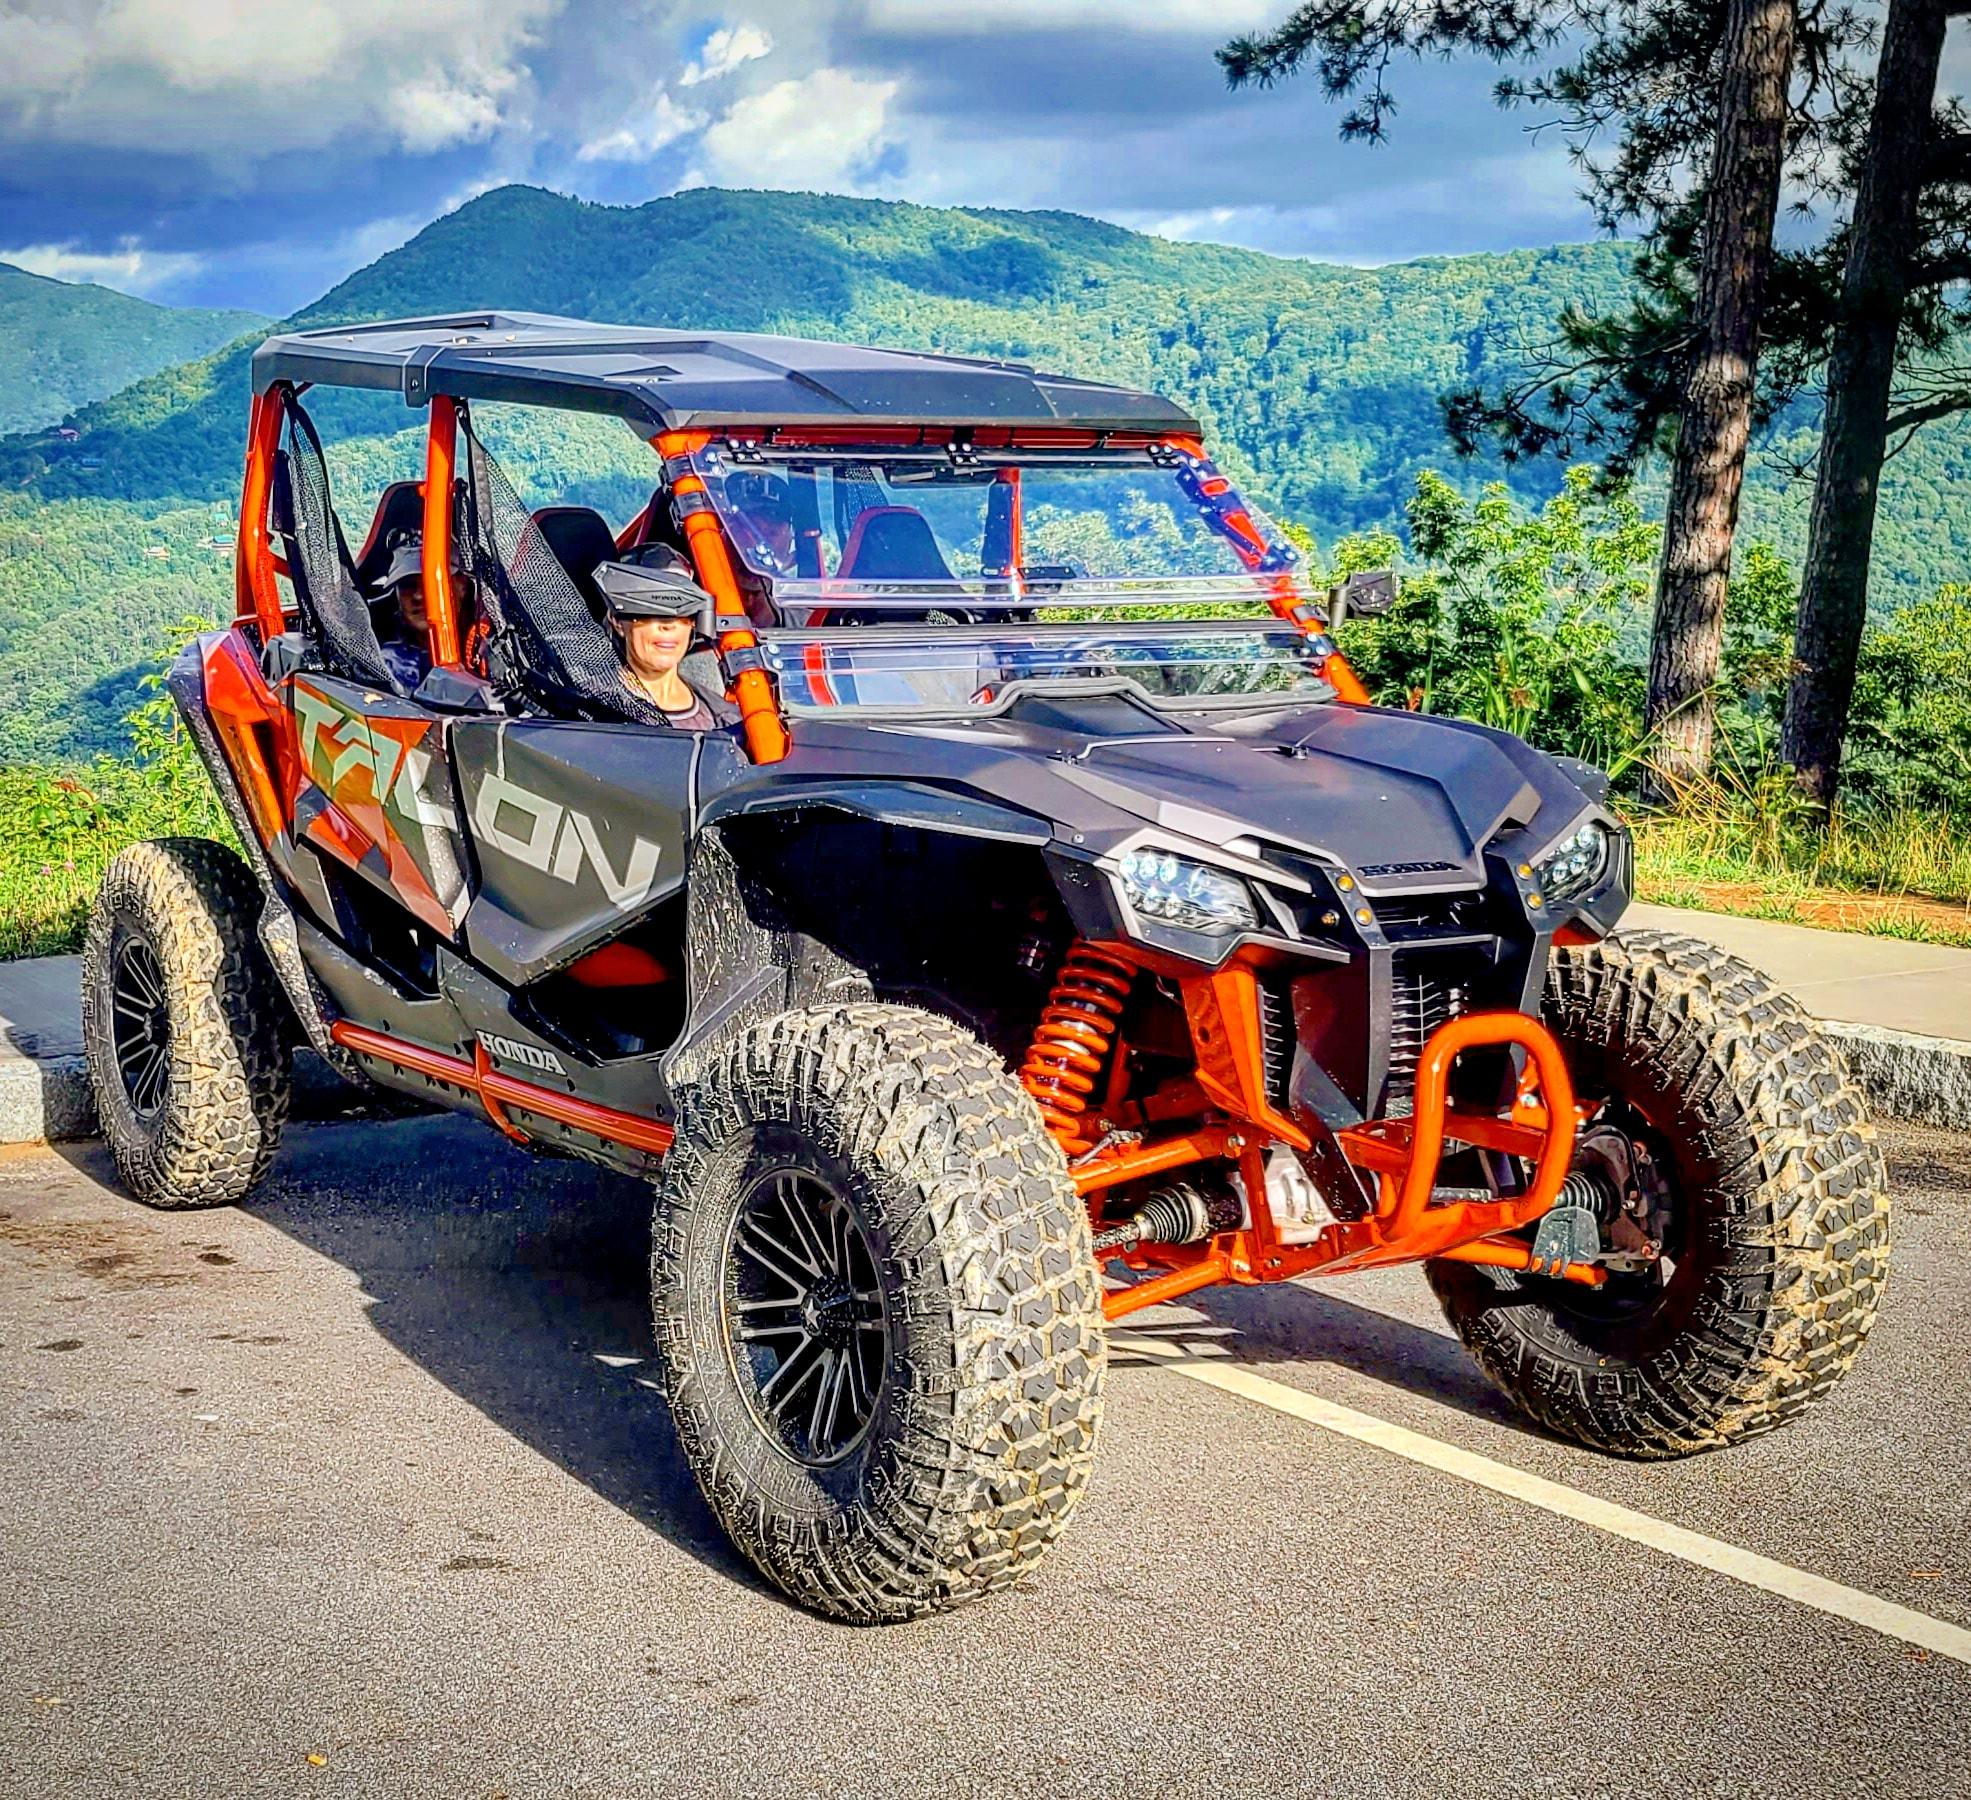 Smoky Mountain Adventure Rentals 22